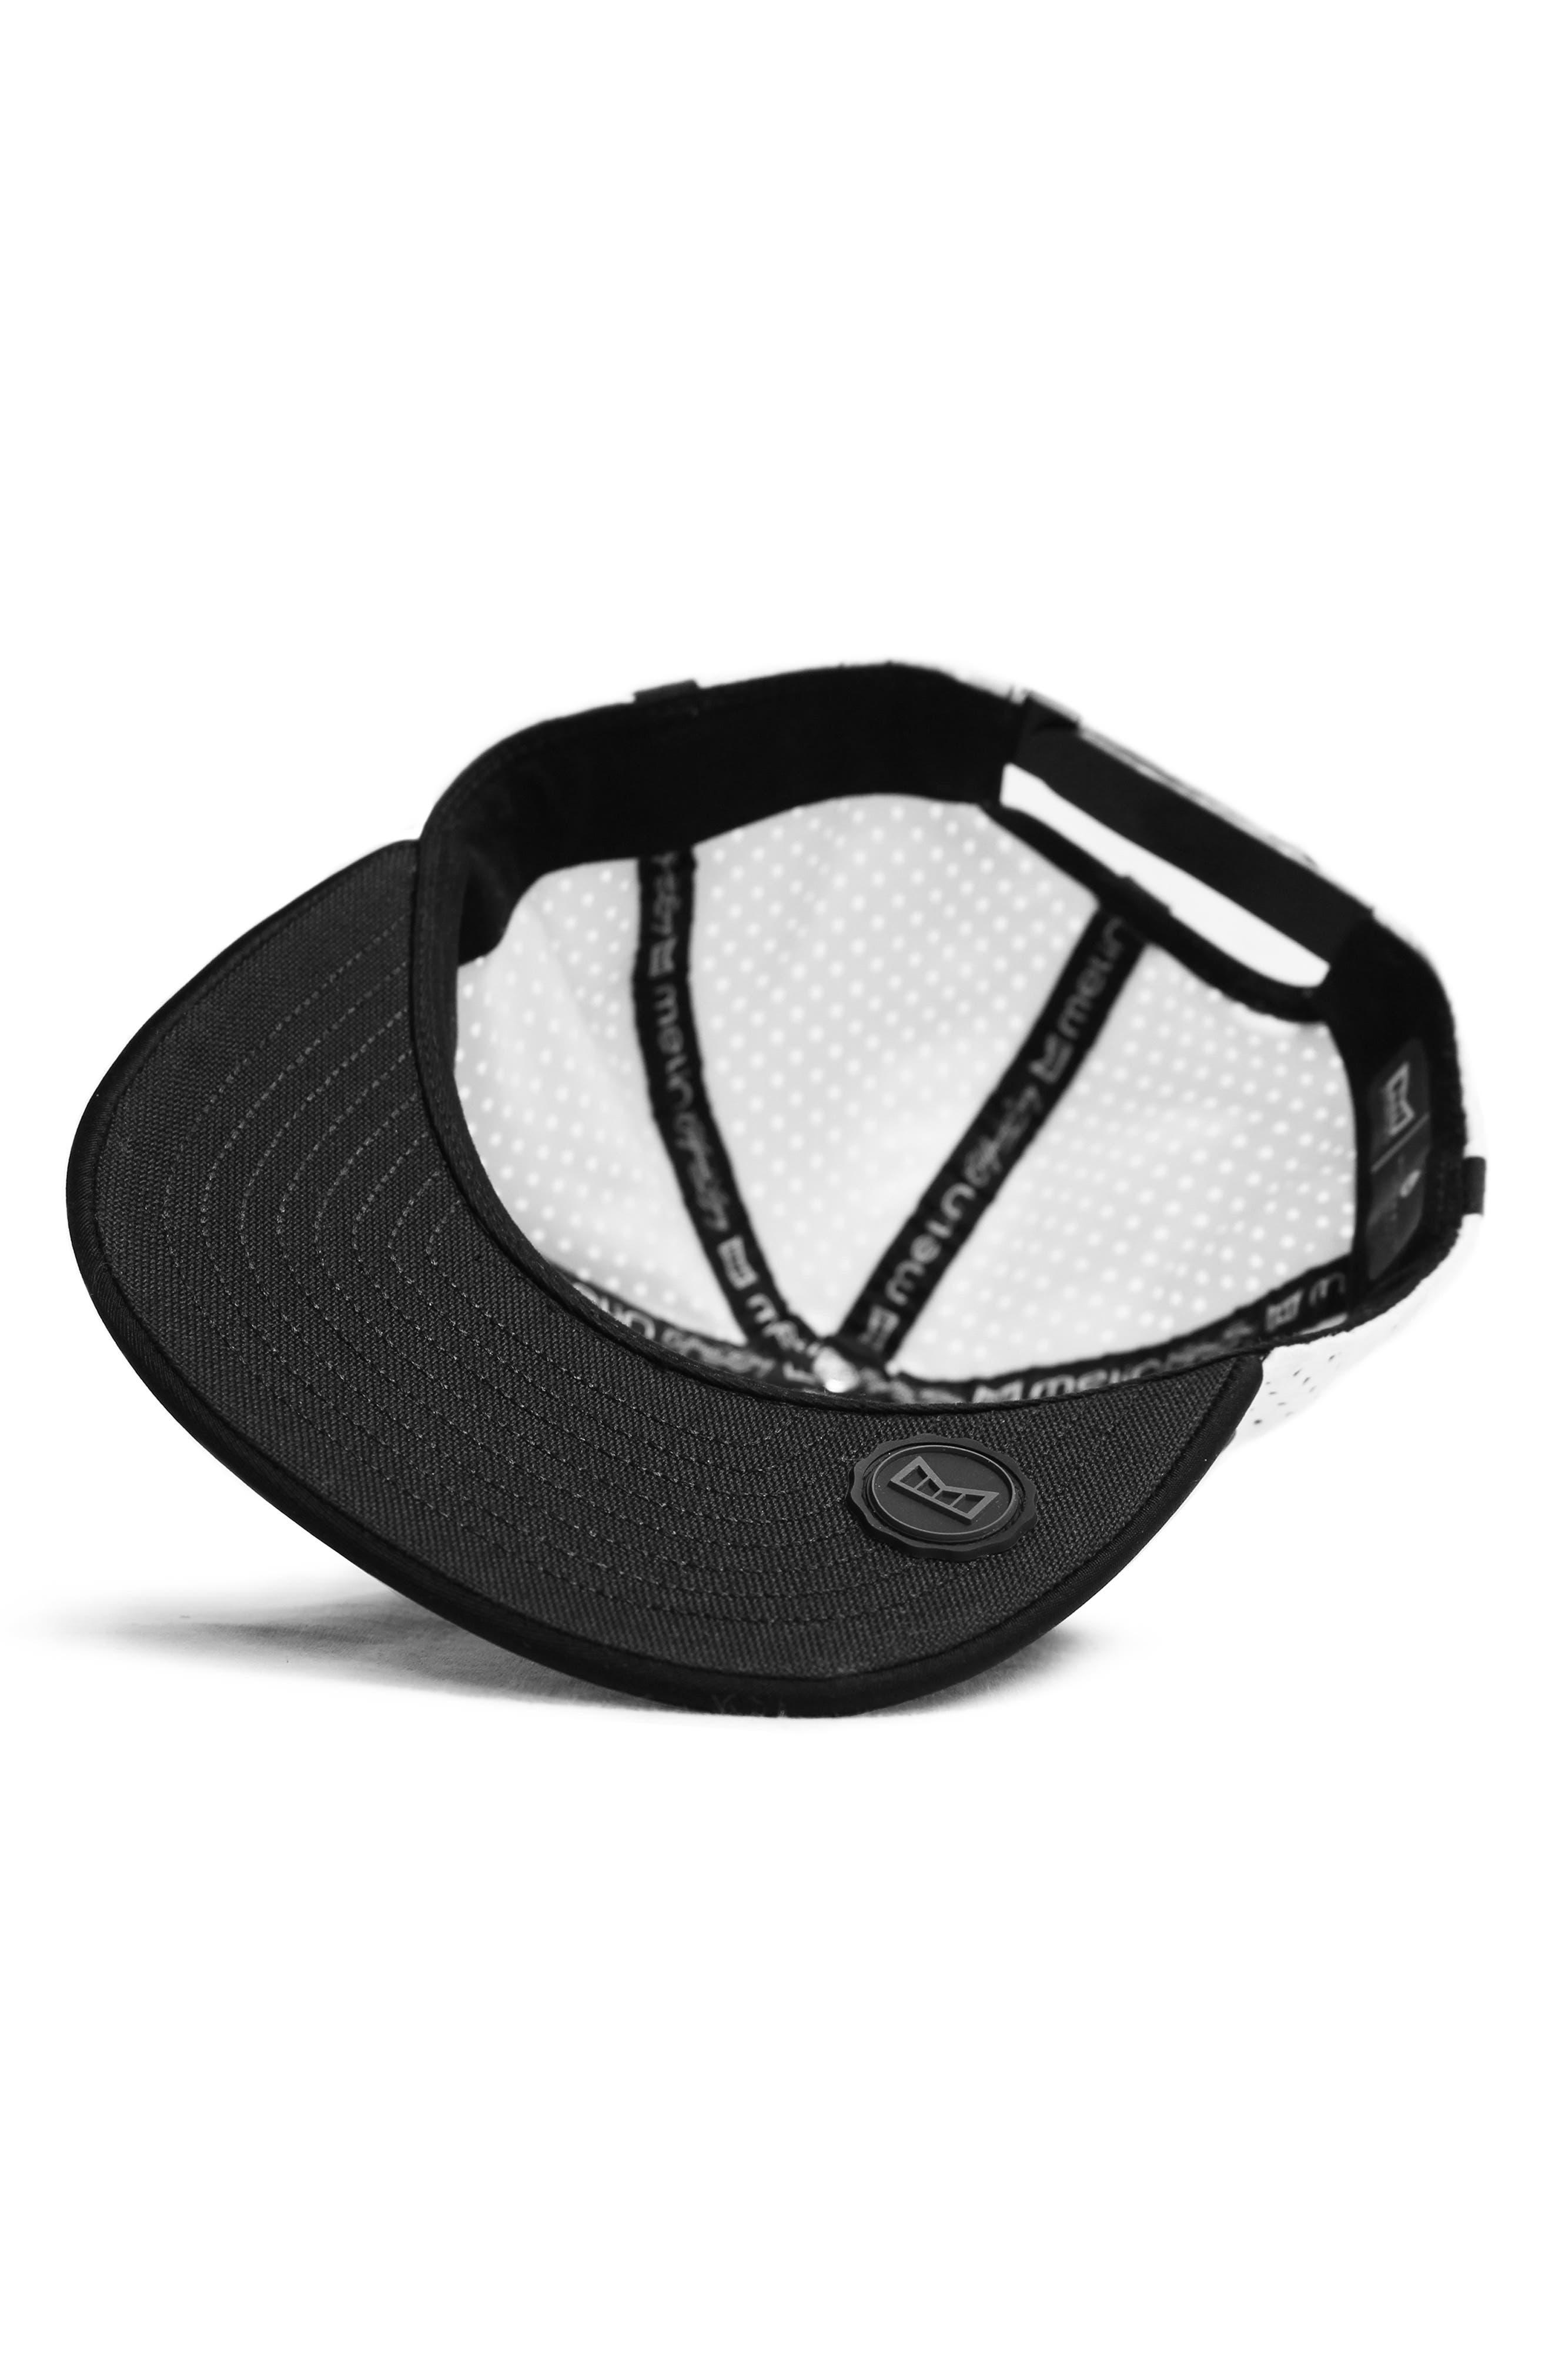 'Amphibian' Split Fit Snapback Baseball Cap,                             Alternate thumbnail 9, color,                             006